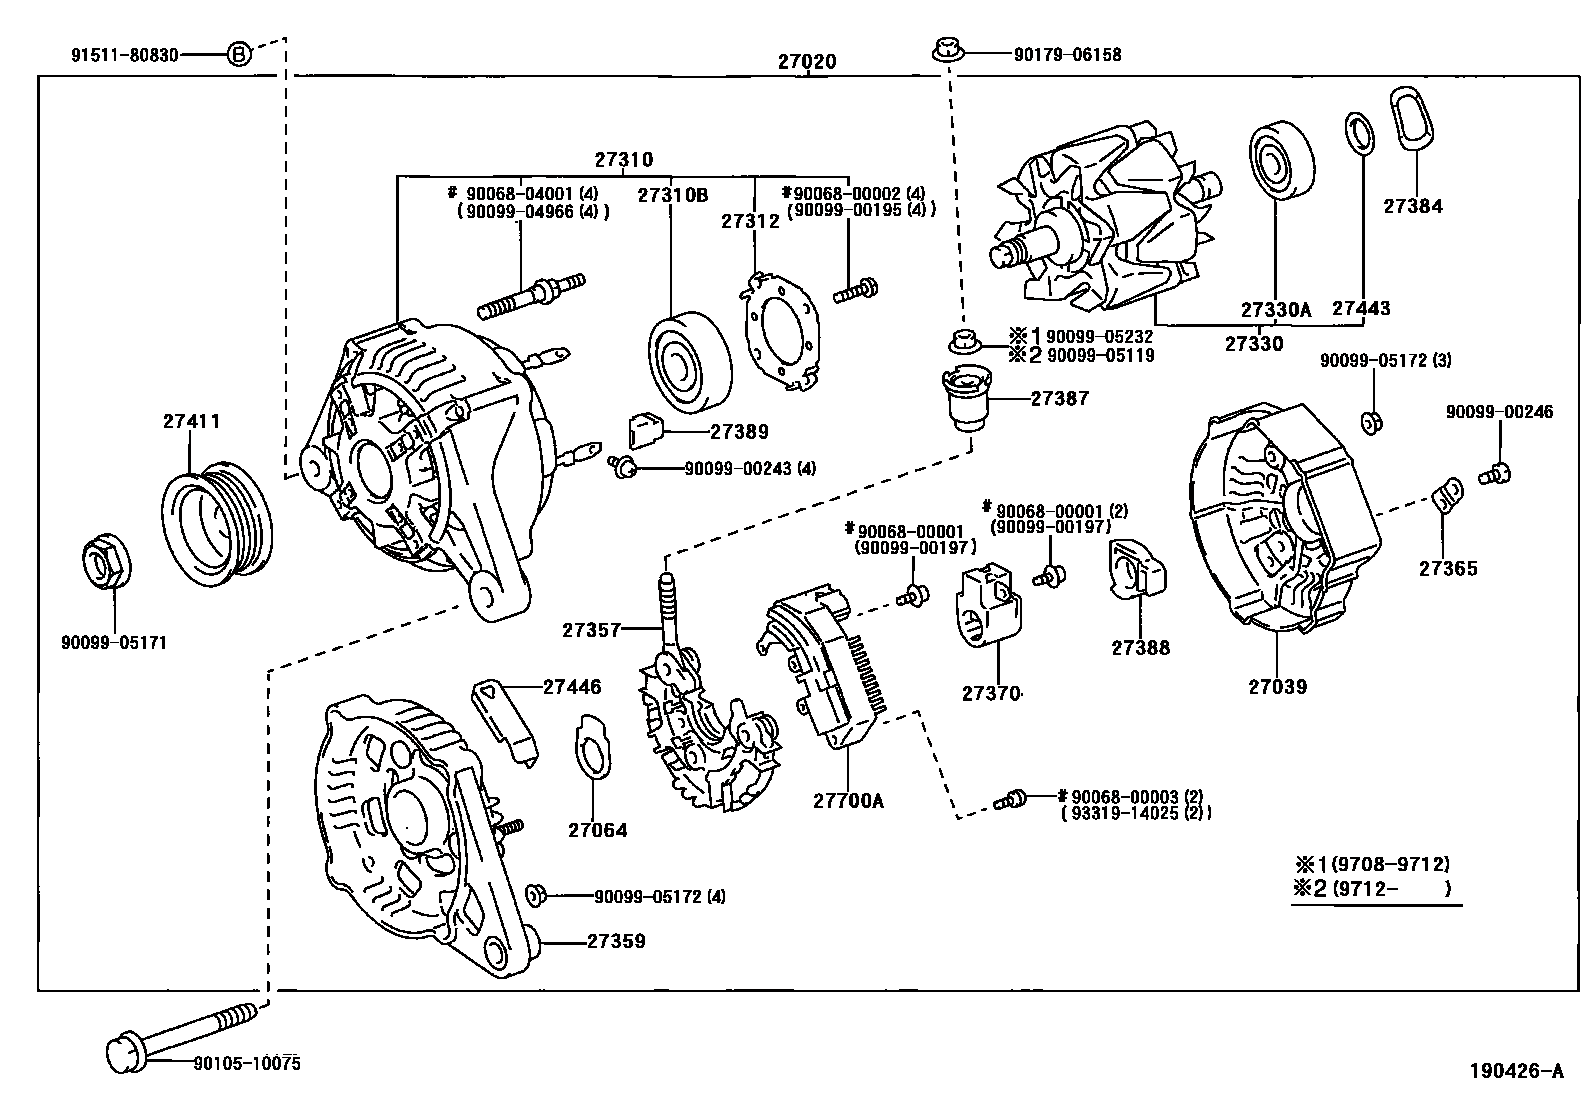 hight resolution of diy 1999 toyota corolla ve 1zzfe engine alternator exploded diagram 2003 ford f 250 engine diagram toyota corolla 2010 engine diagram